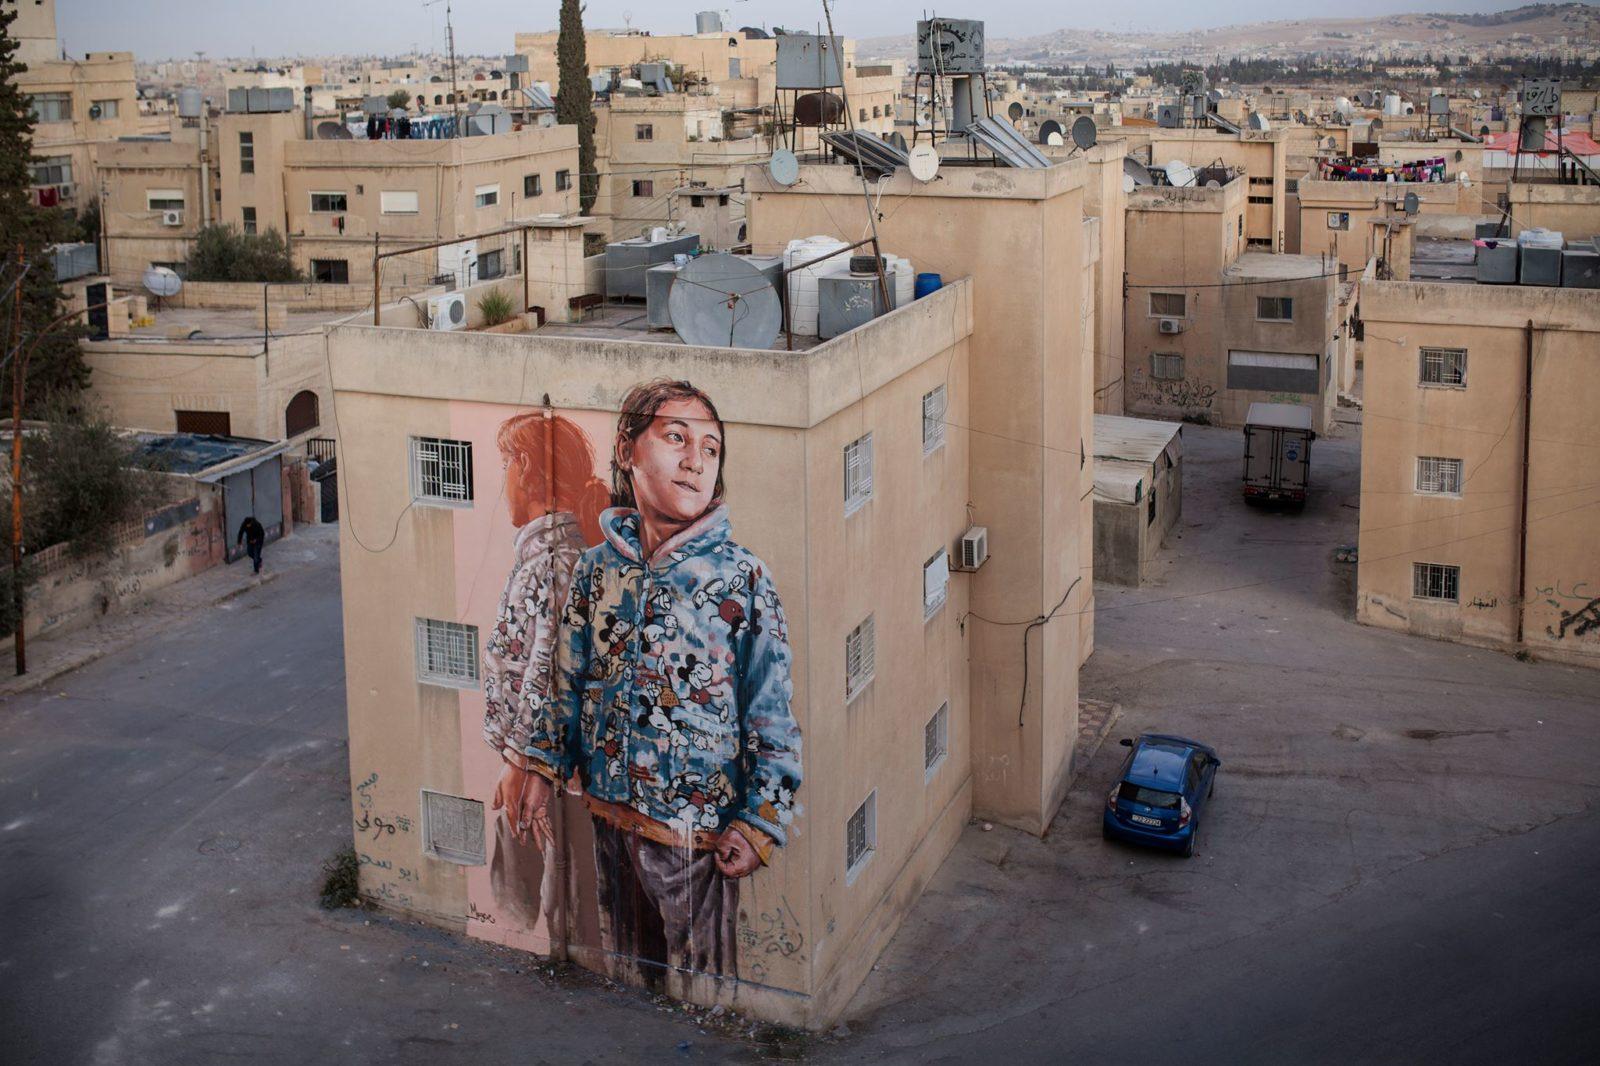 Fintan Magee paints a mural in Amman Jordan